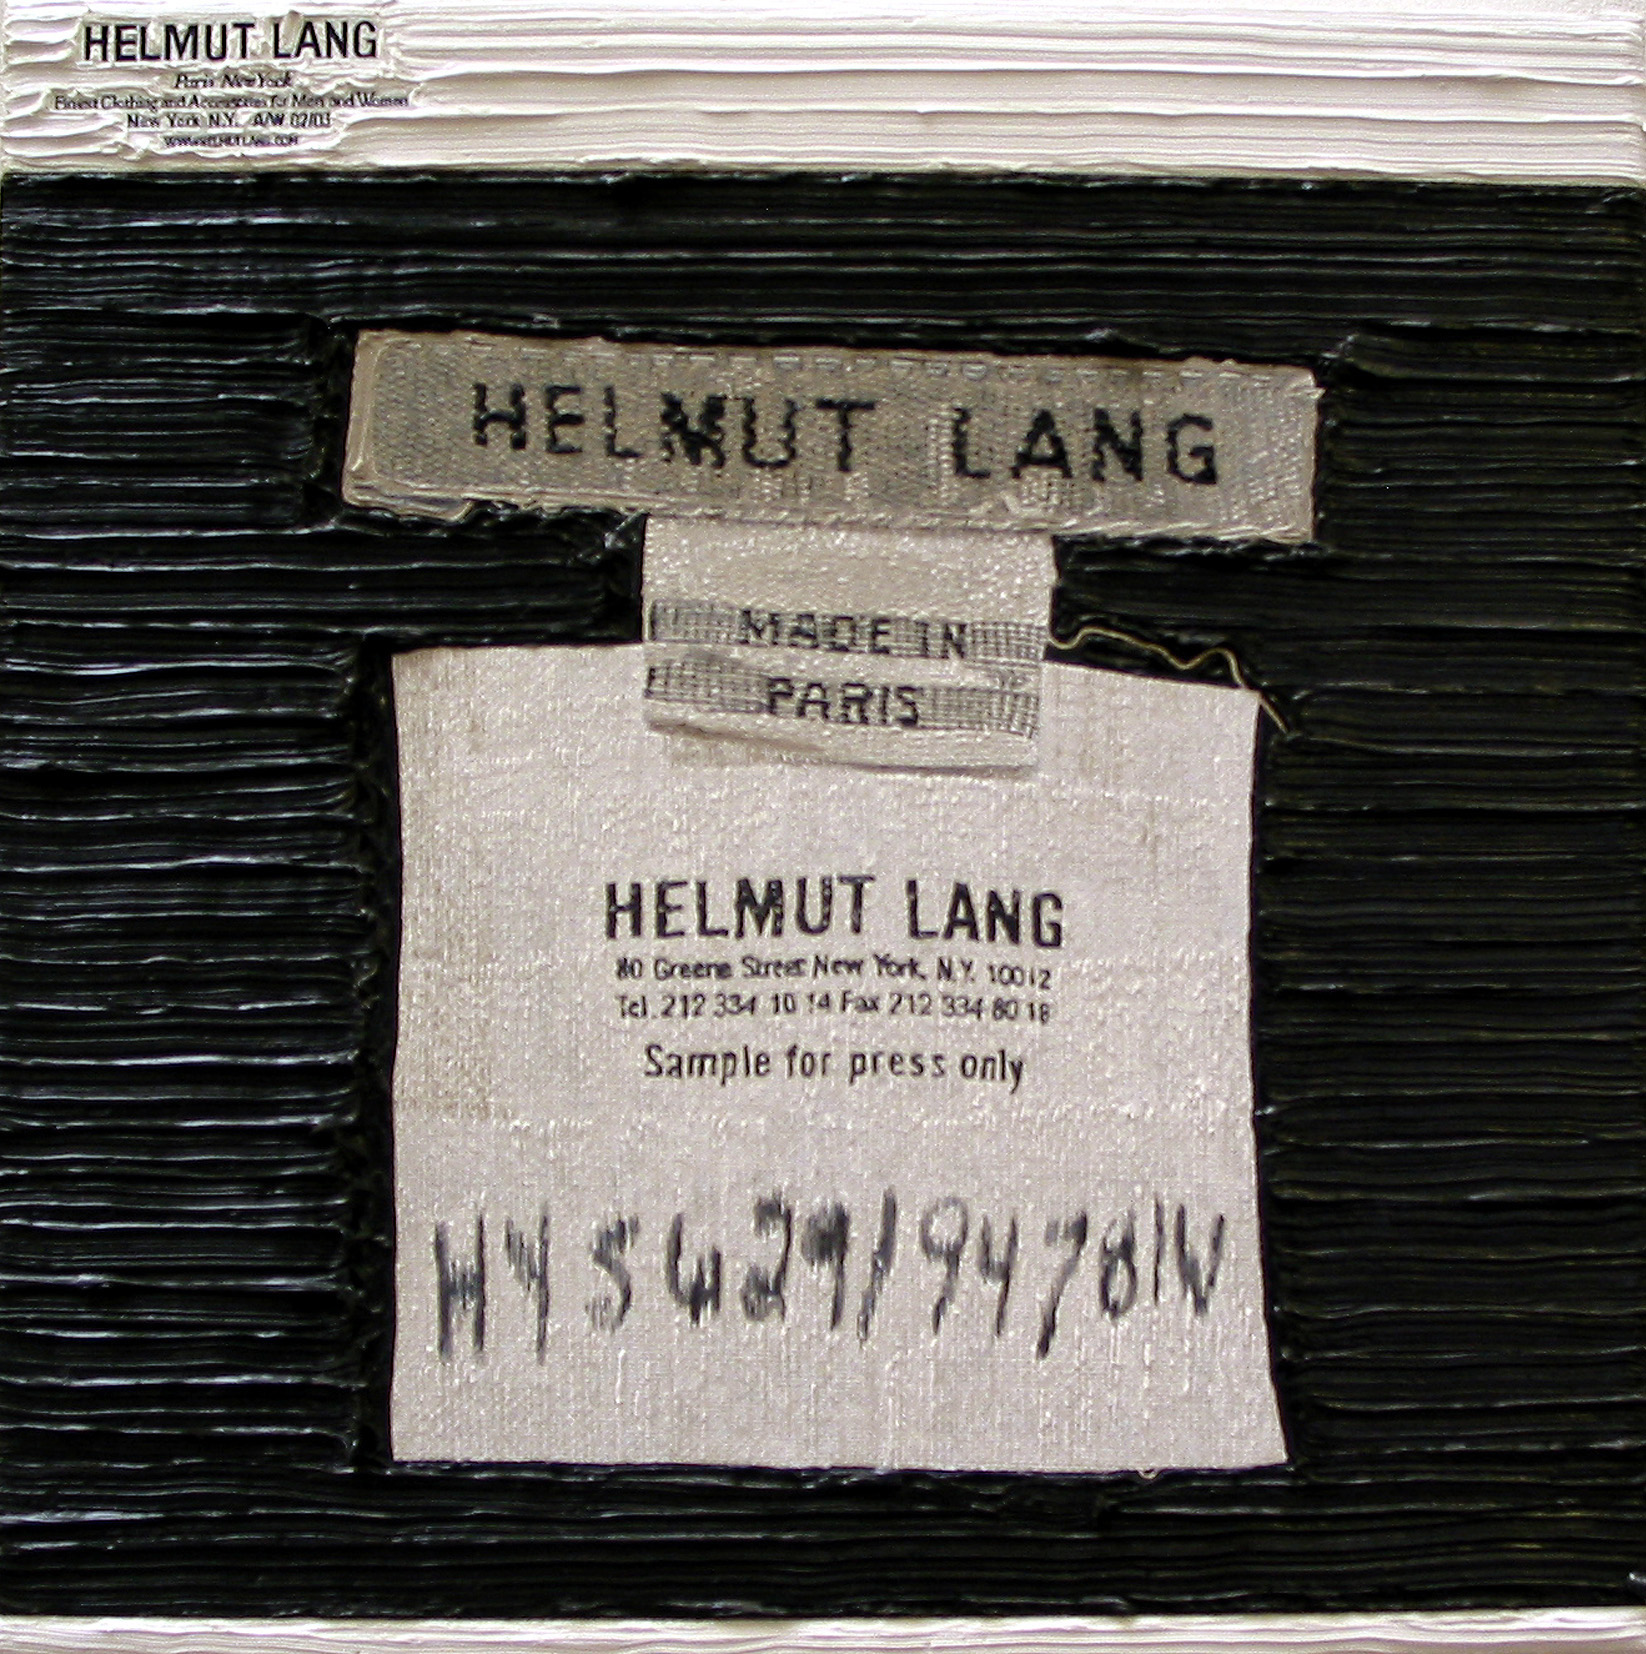 Helmut Lang, Artforum (Label)